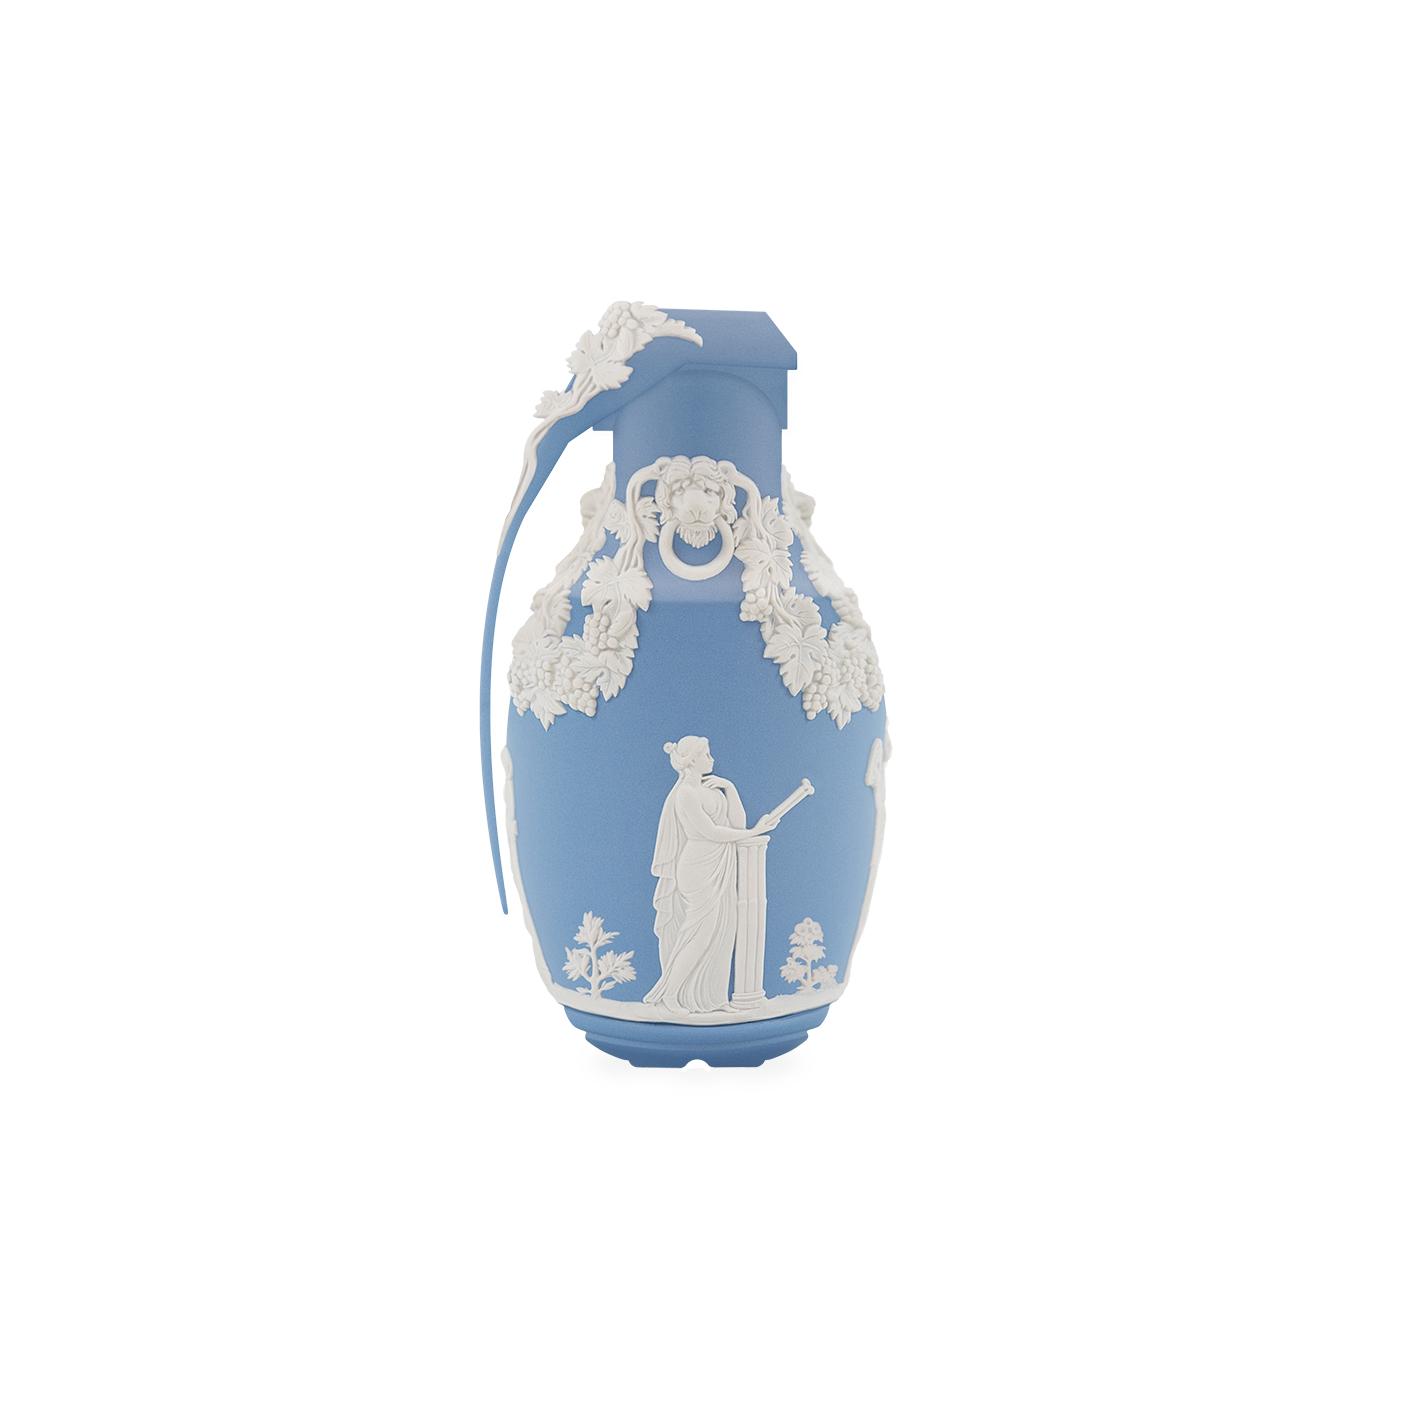 jasperware-grenade-blue.jpg